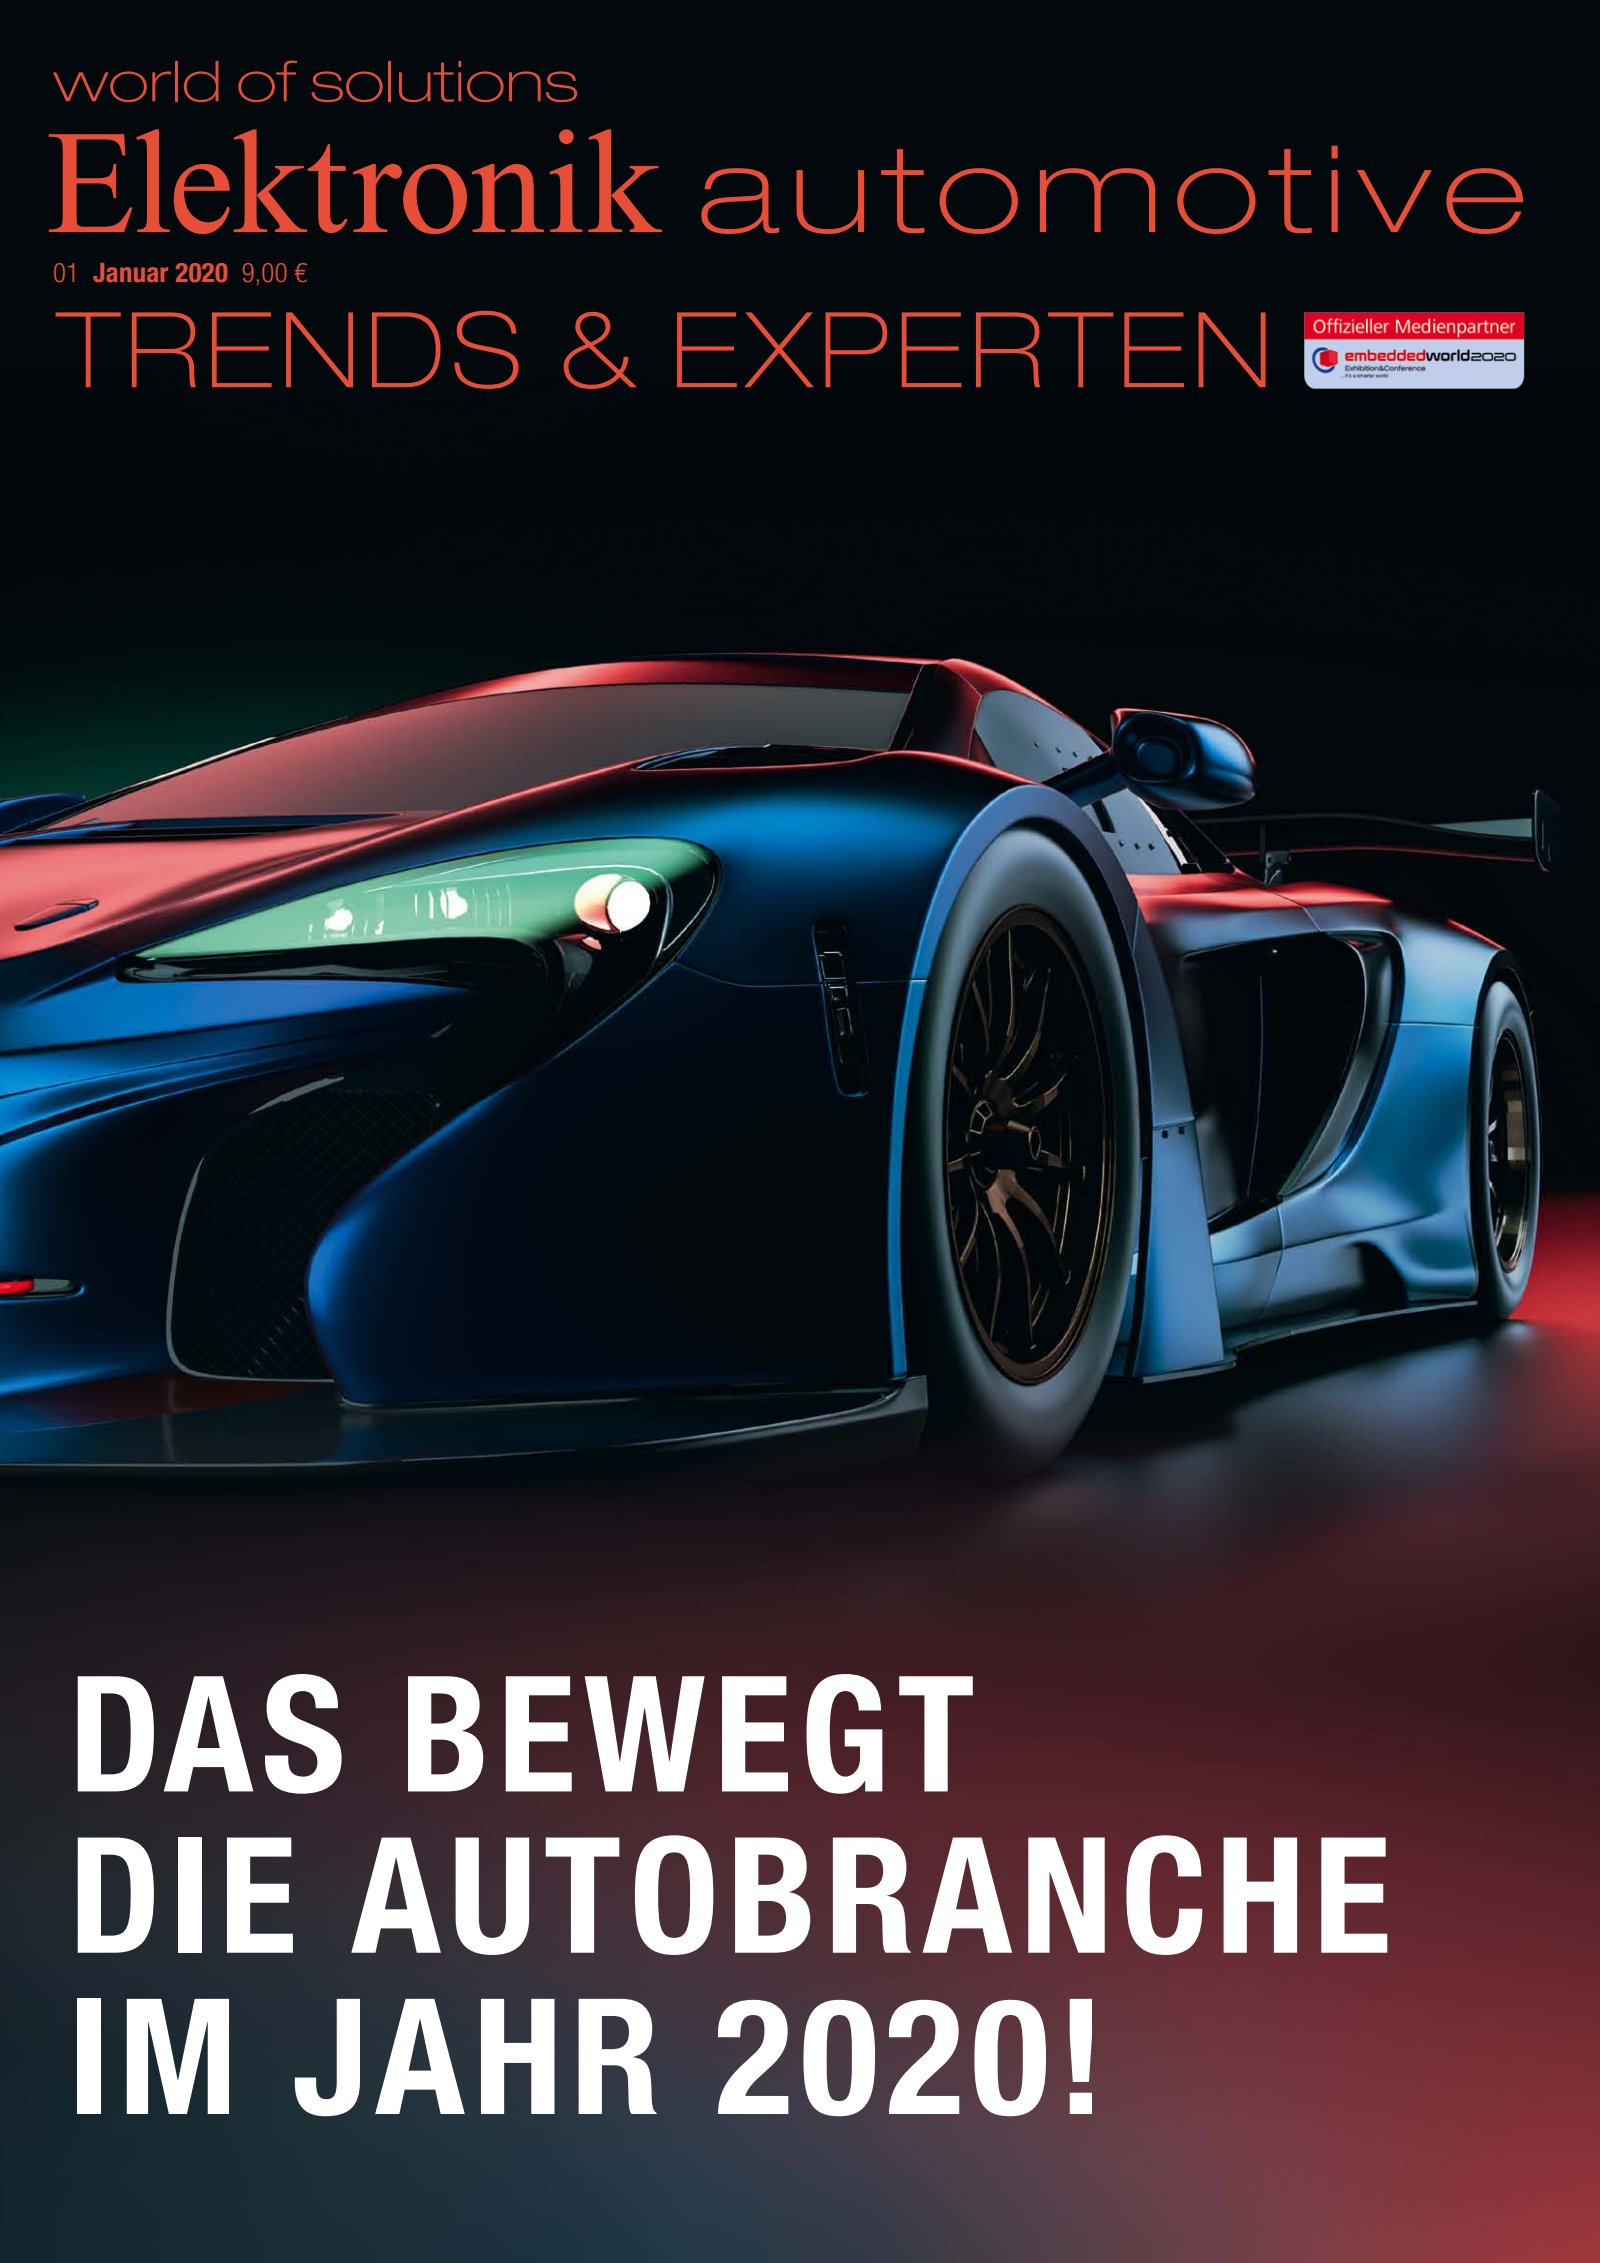 Elektronik automotive 01/2020 Digital